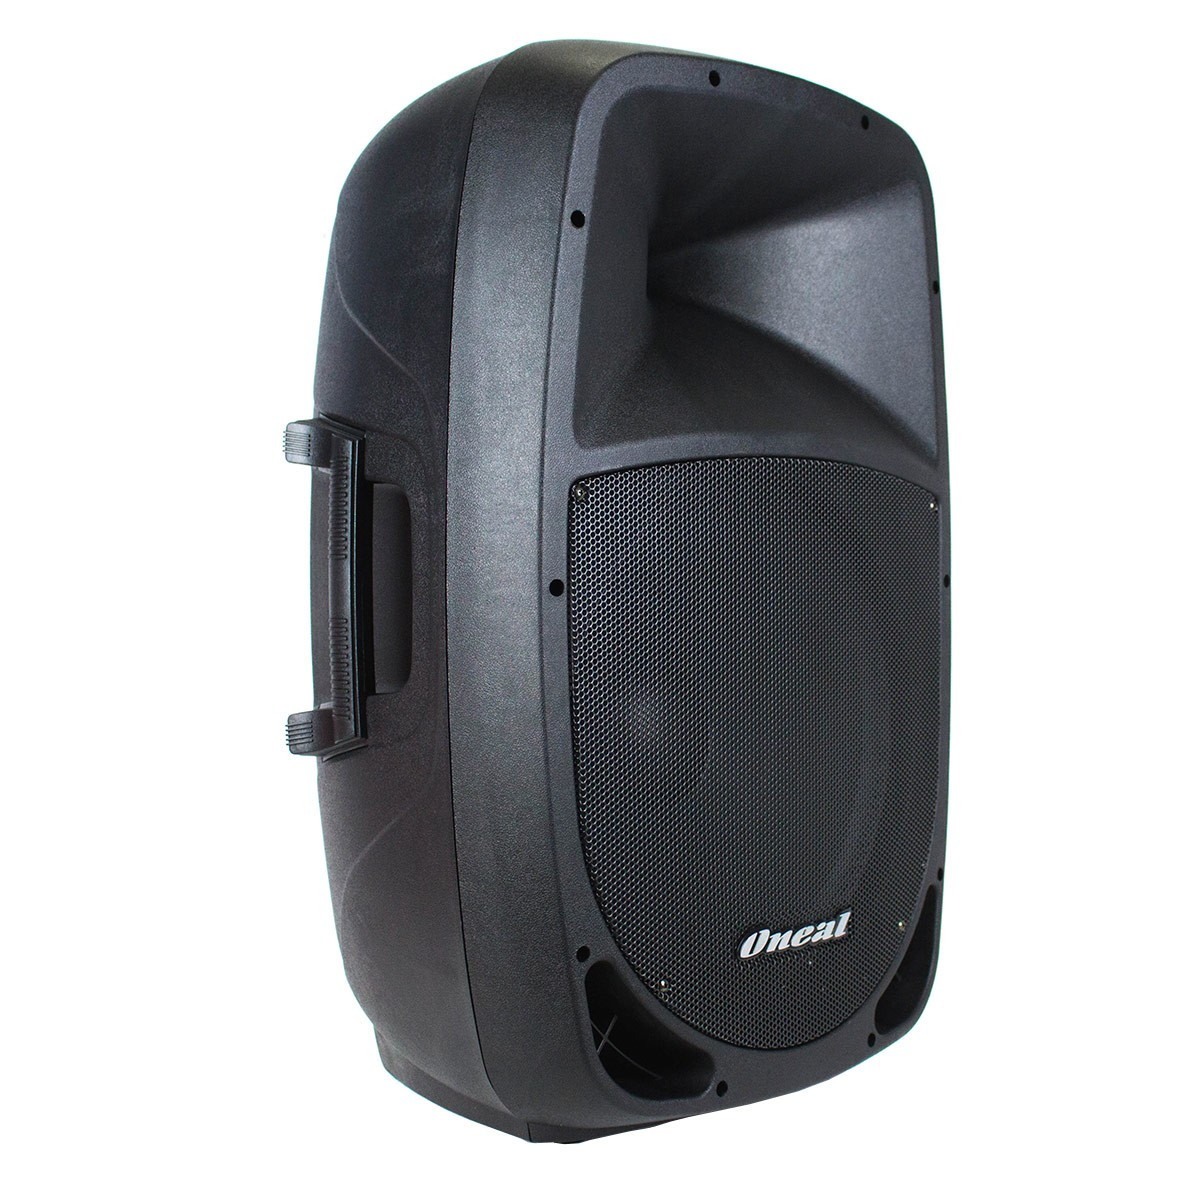 Caixa Ativa Fal 15 Pol 220W c/ USB / Bluetooth - OPB 1115 USB BT Oneal